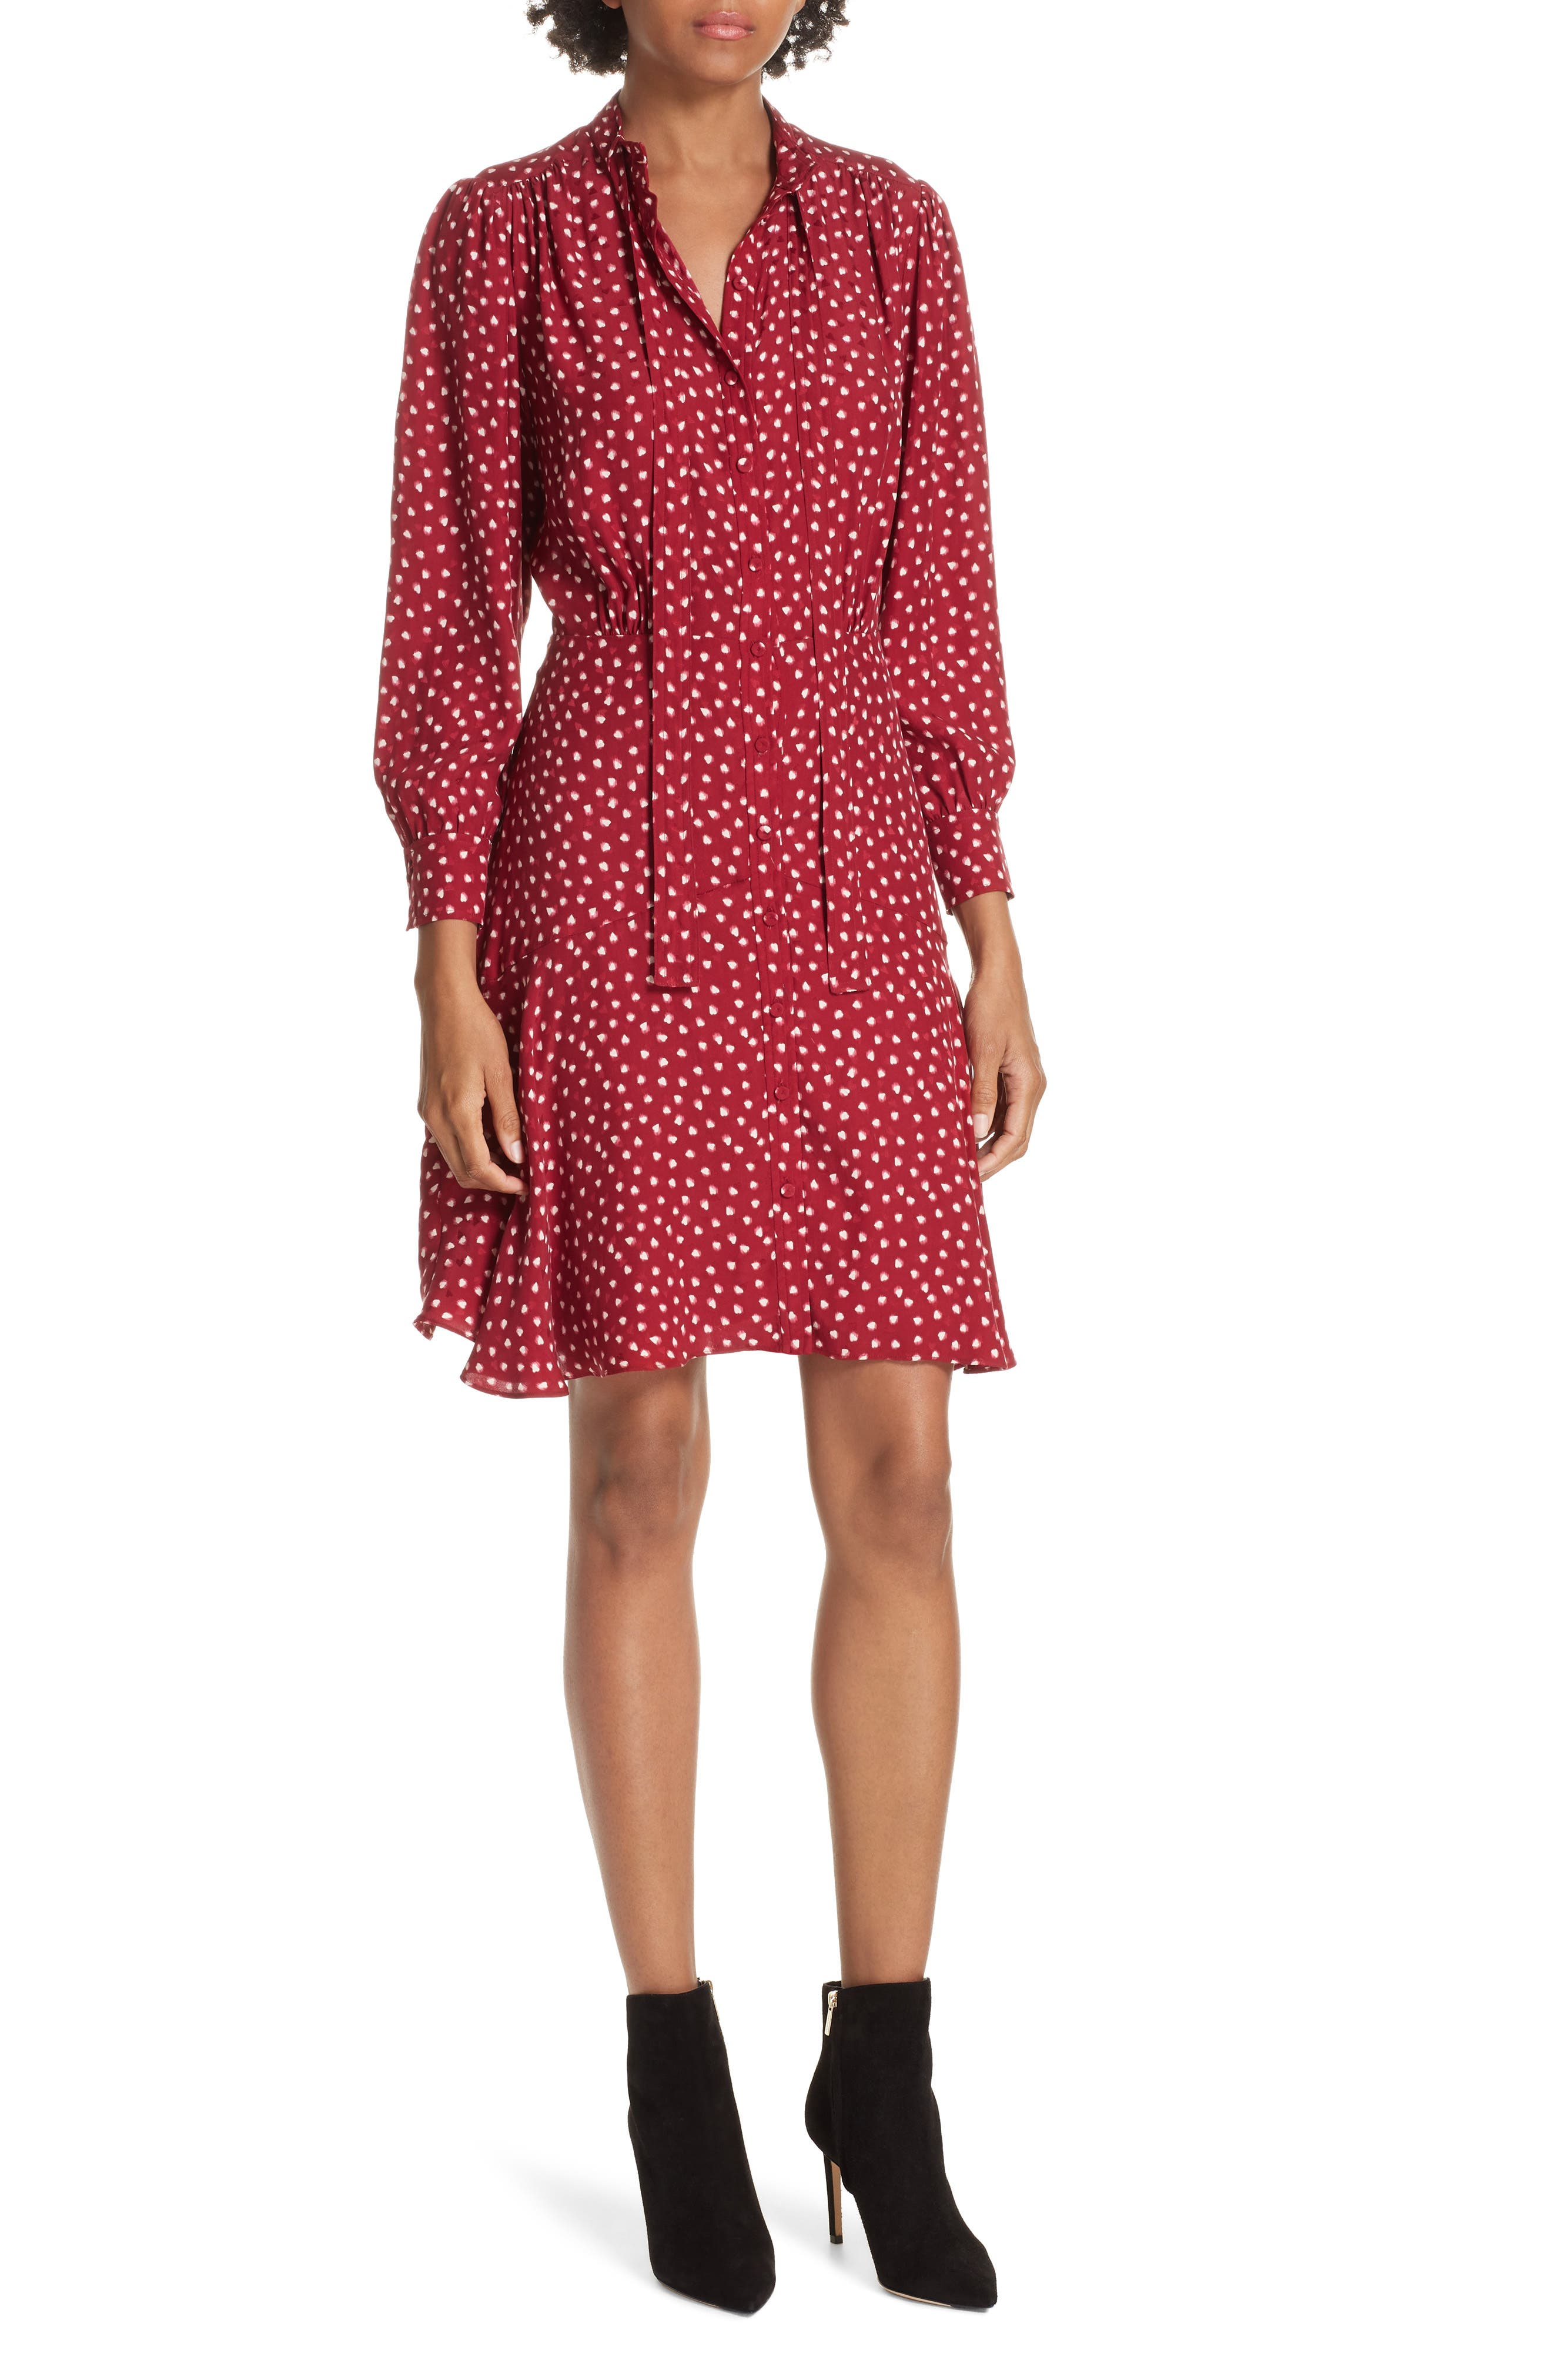 REBECCA TAYLOR Dot Print Fit & Flare Dress, Main, color, 602